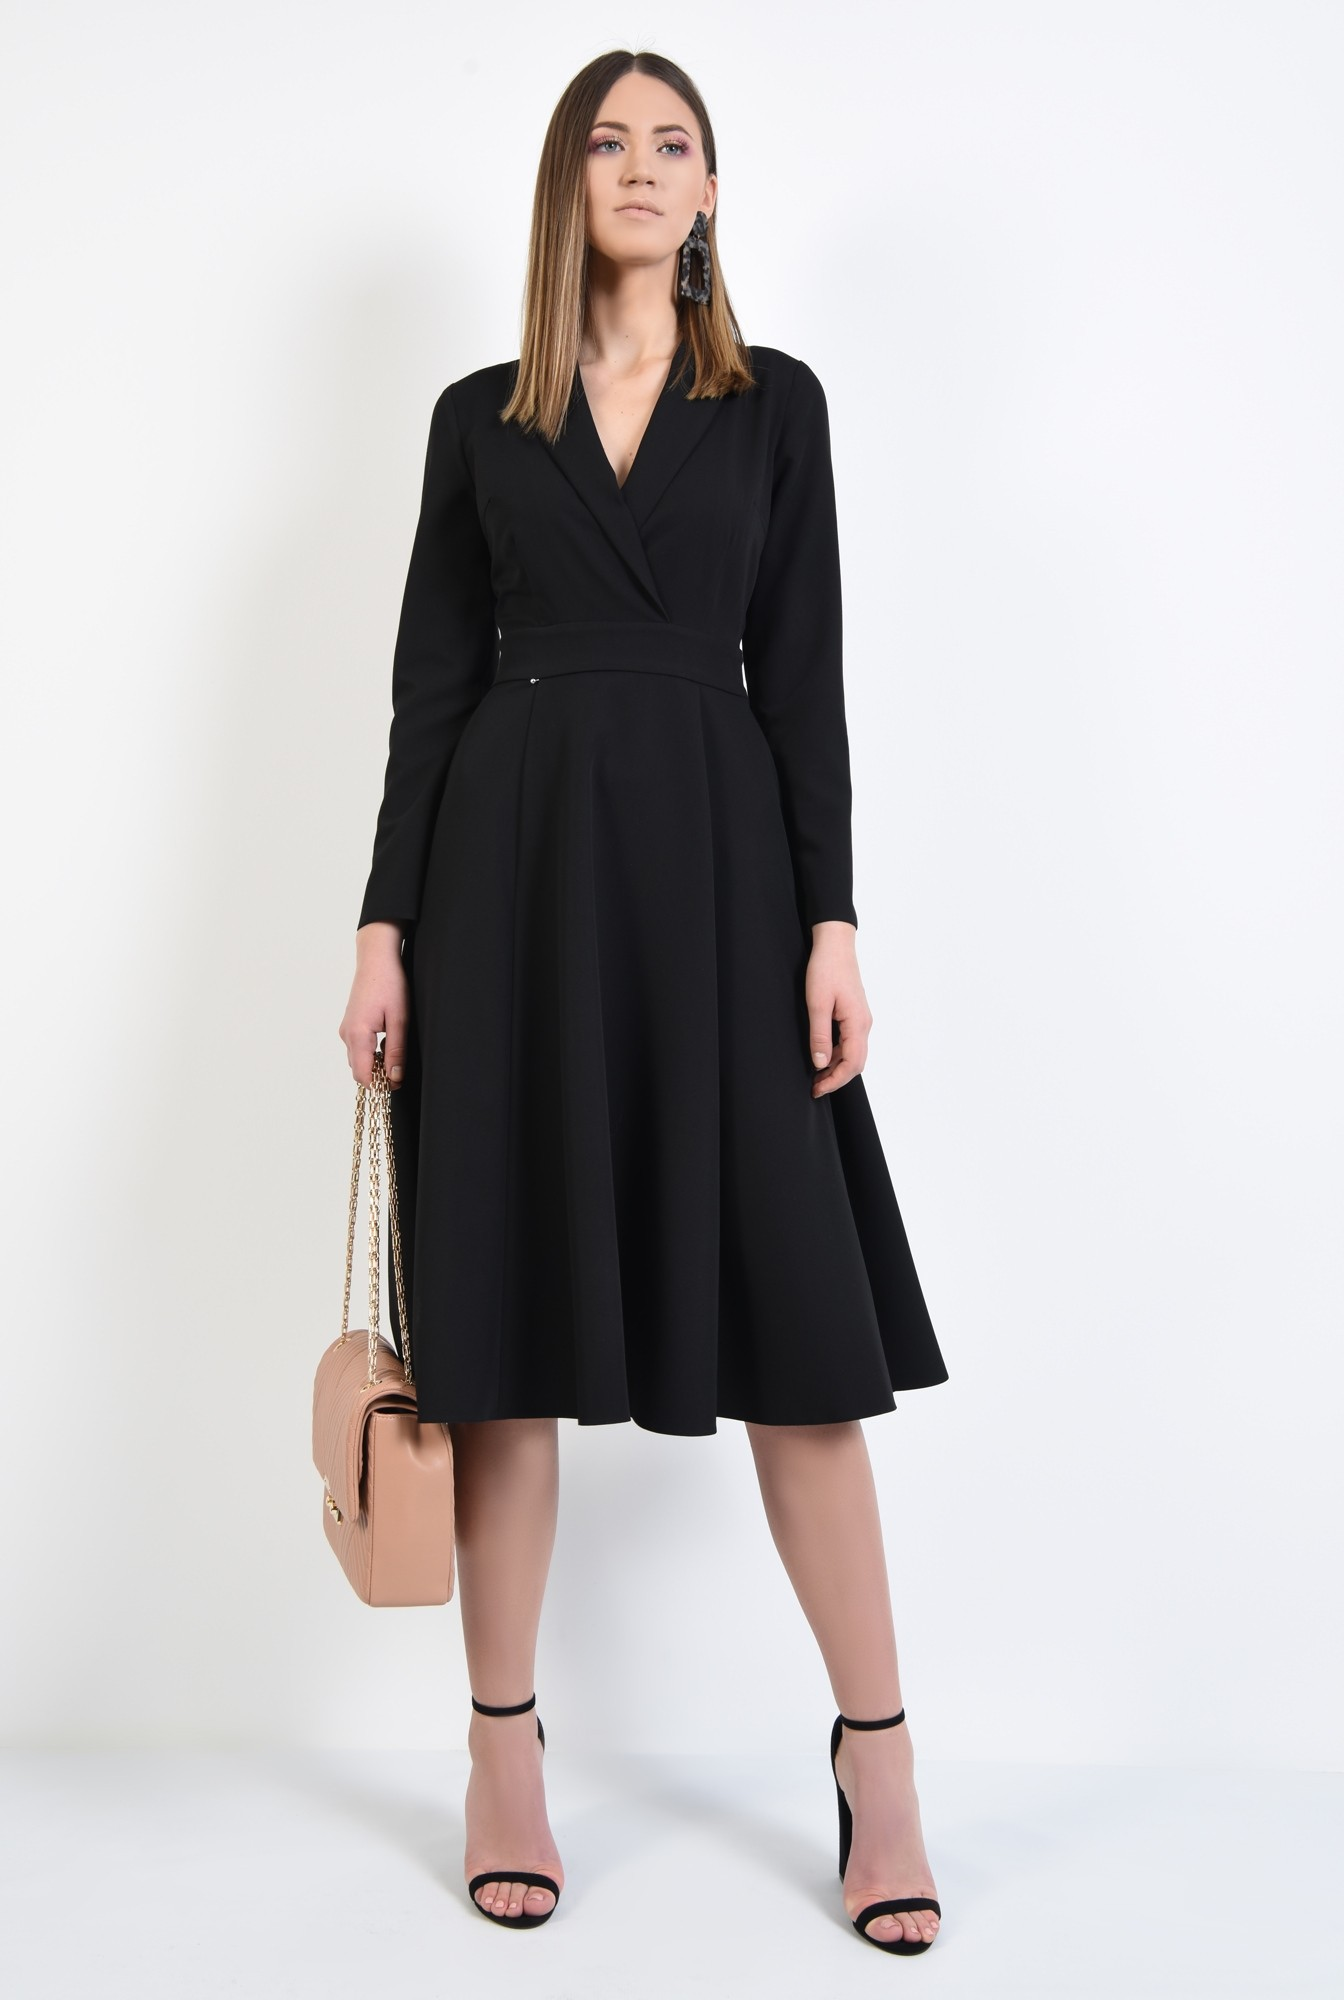 3 - rochie neagra, evazata, midi, talie cu betelie, maneci ajustate